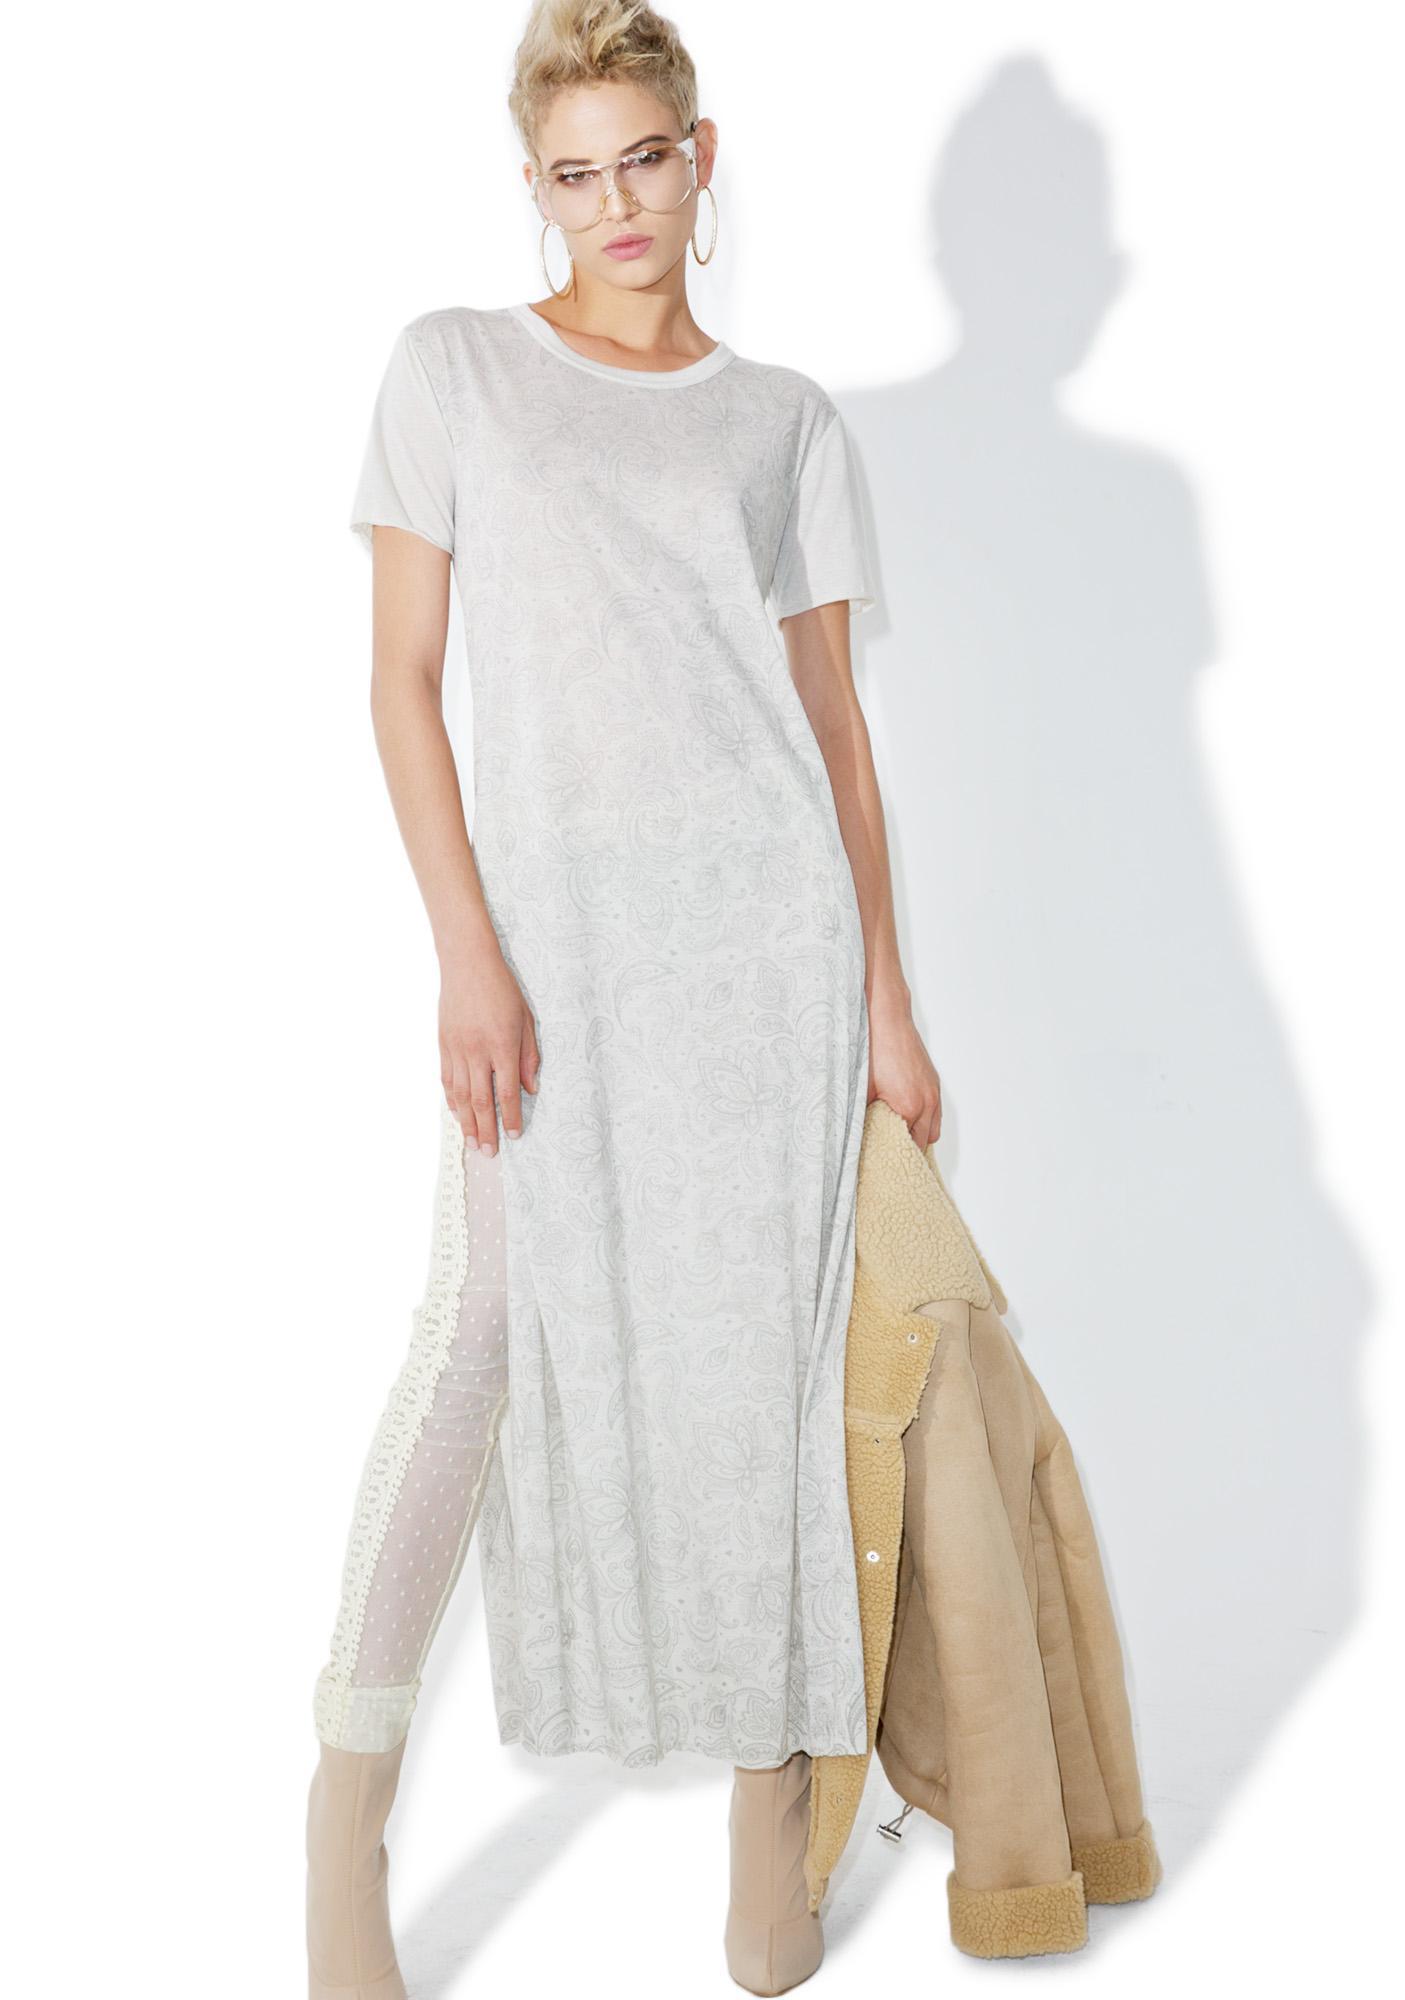 Diamond Supply Radiant Dress